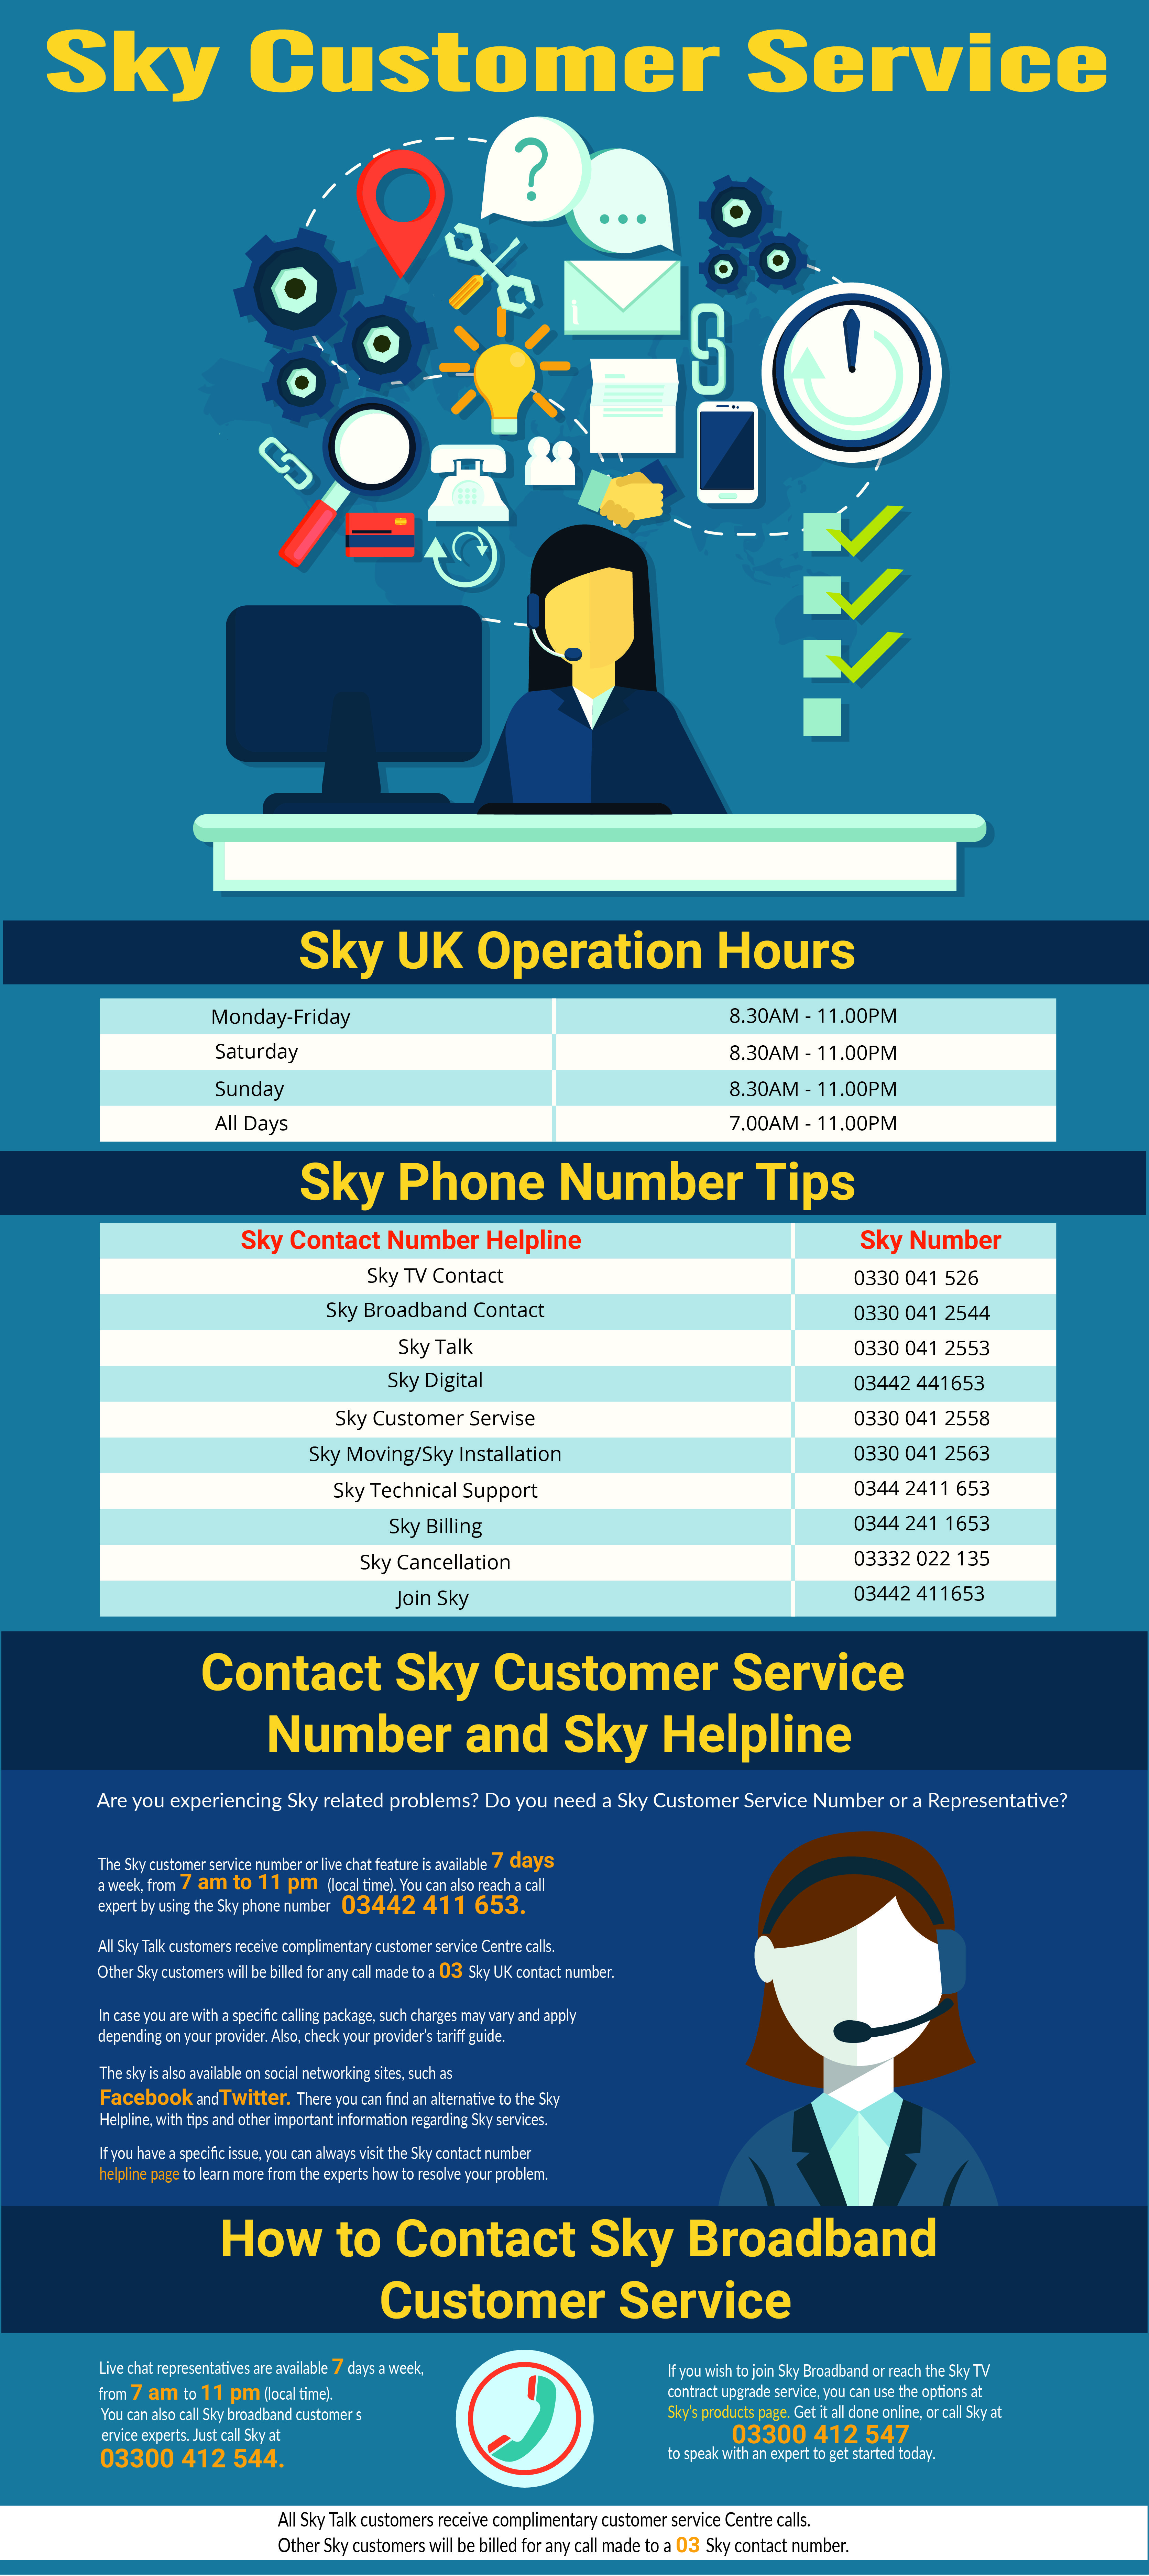 Sky Service Hotline